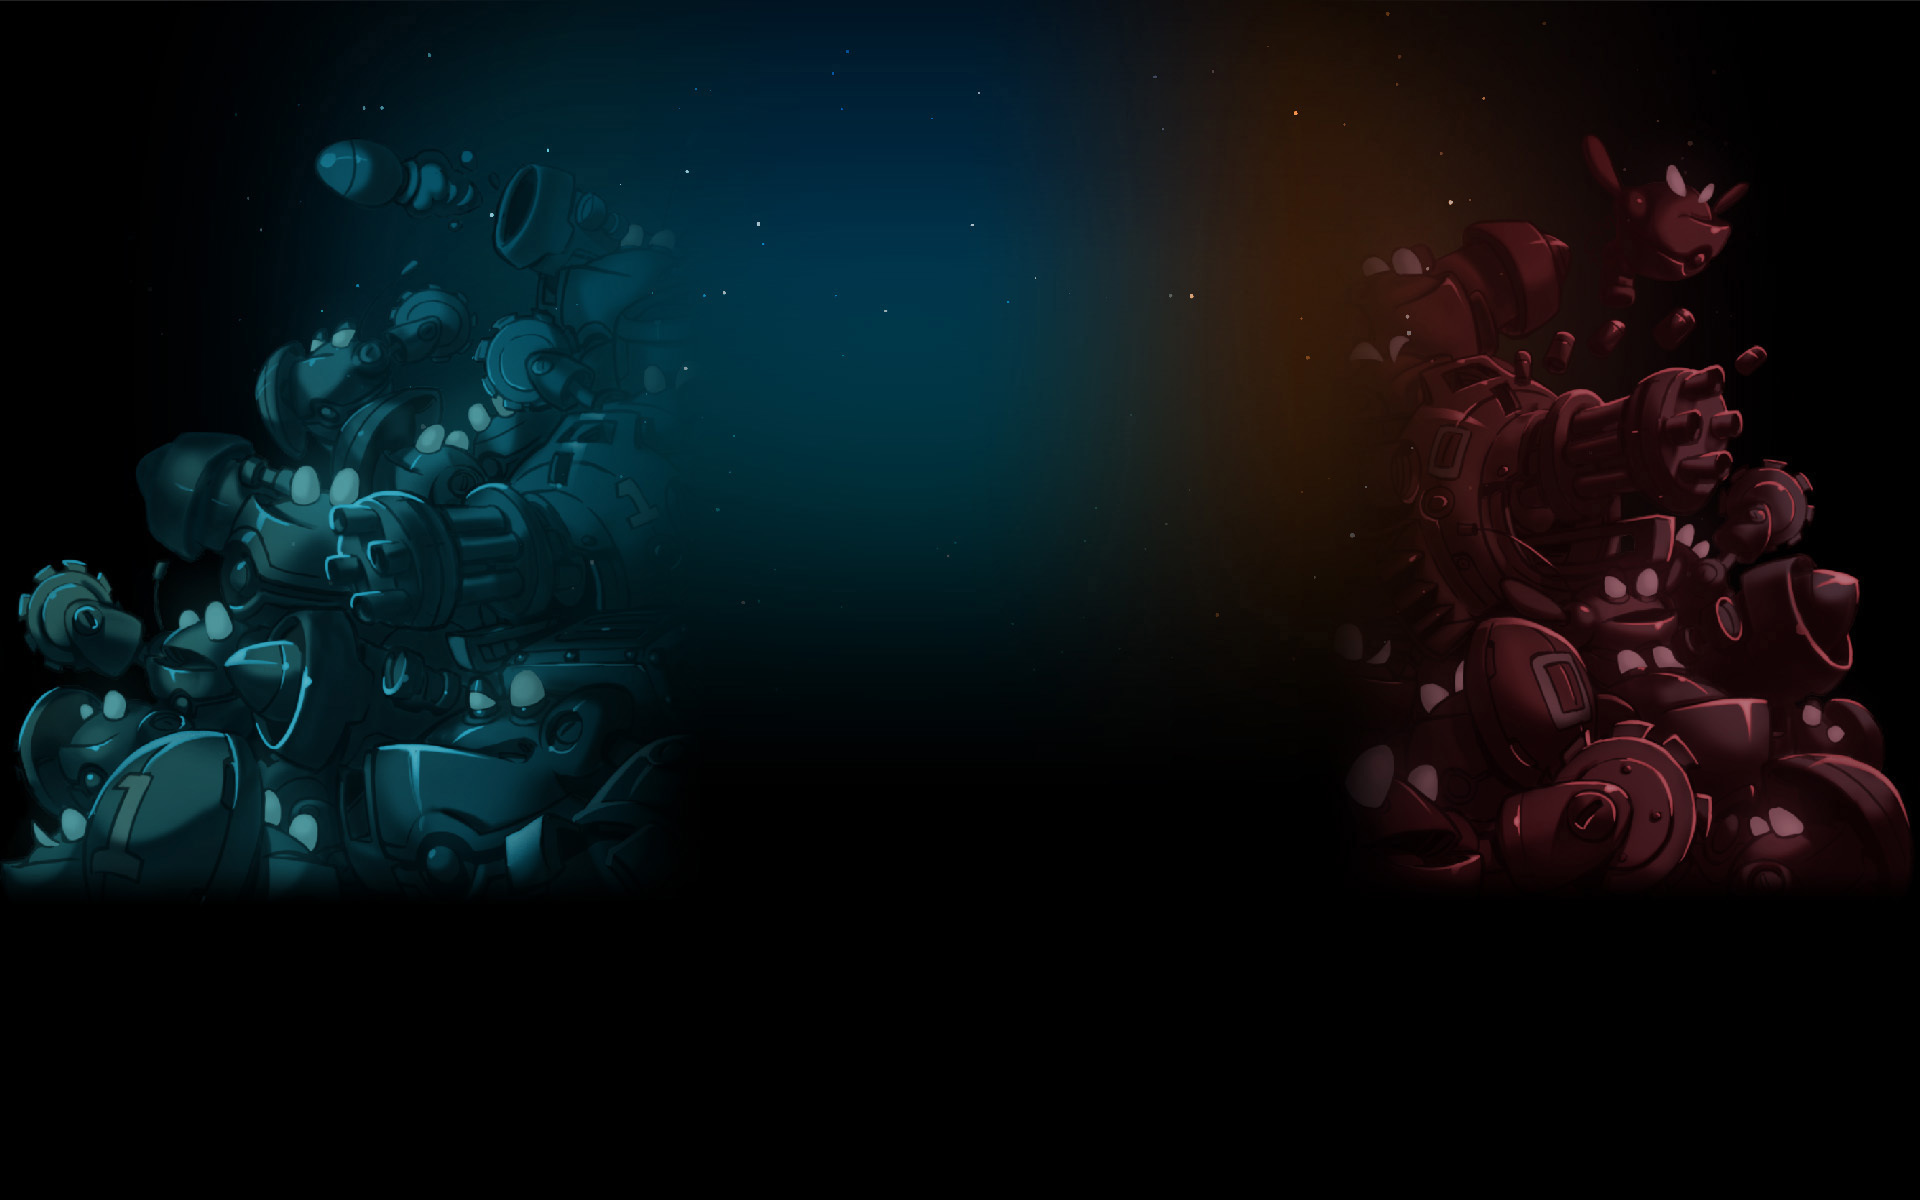 Blue vs. Red